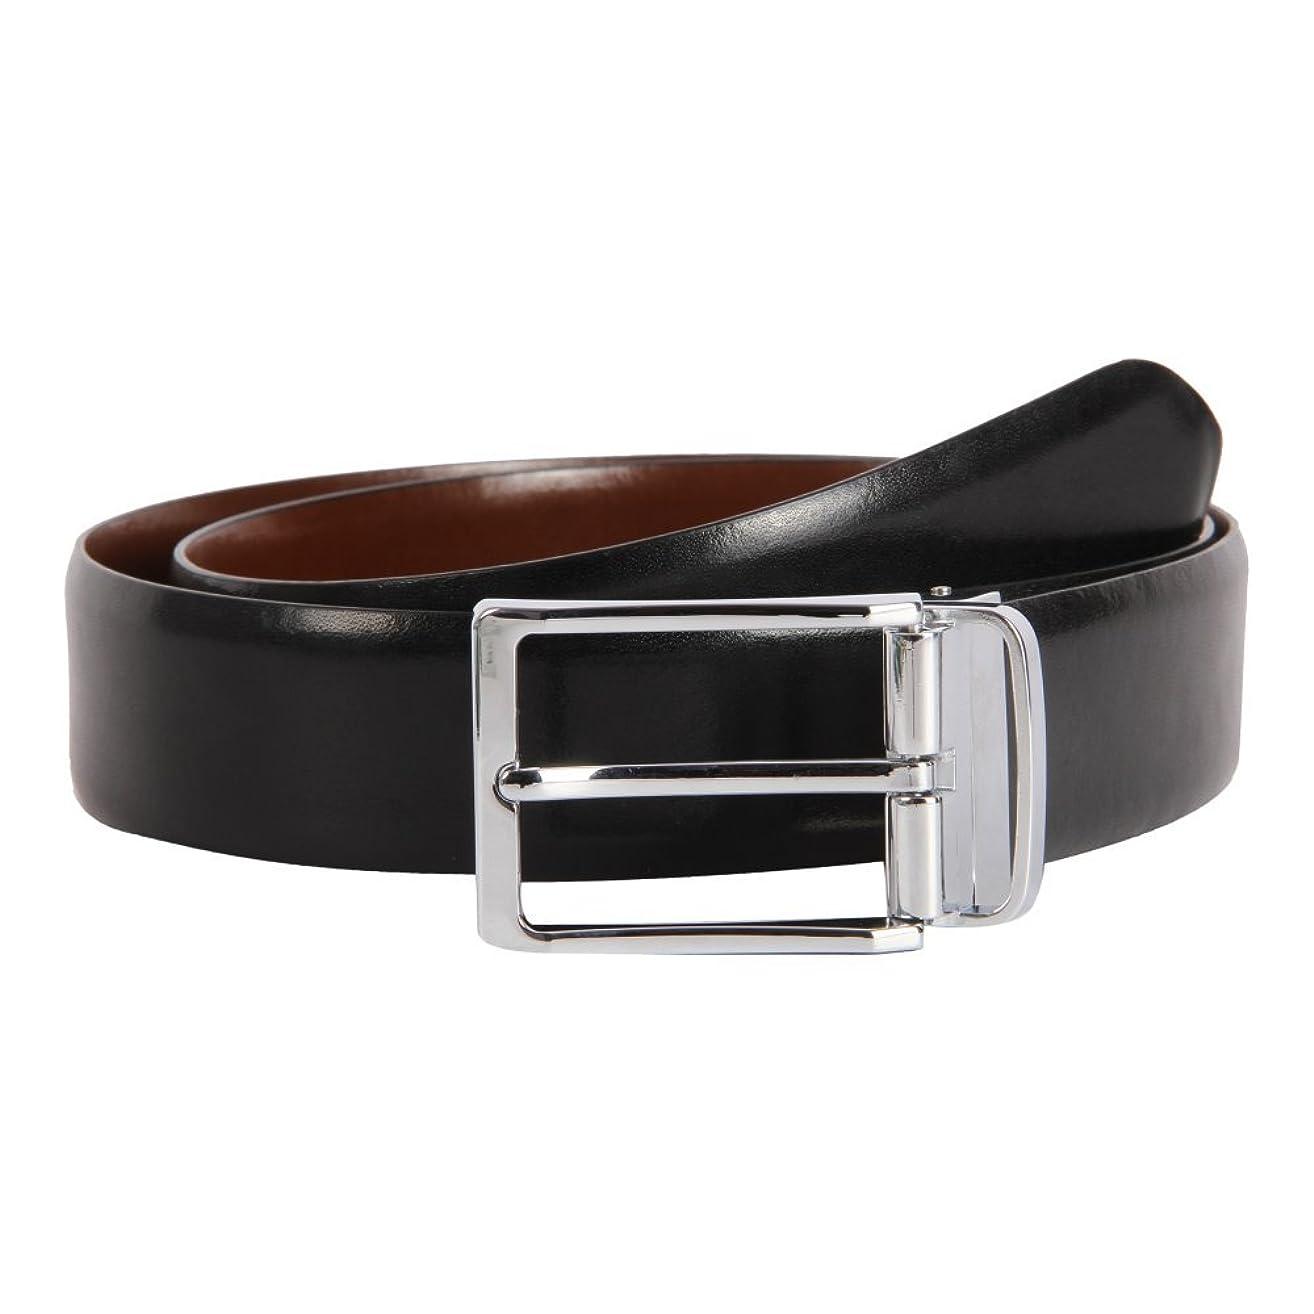 Affilare Men's Genuine Italian Leather Dress Belt Black Brown Reversible 12RB562